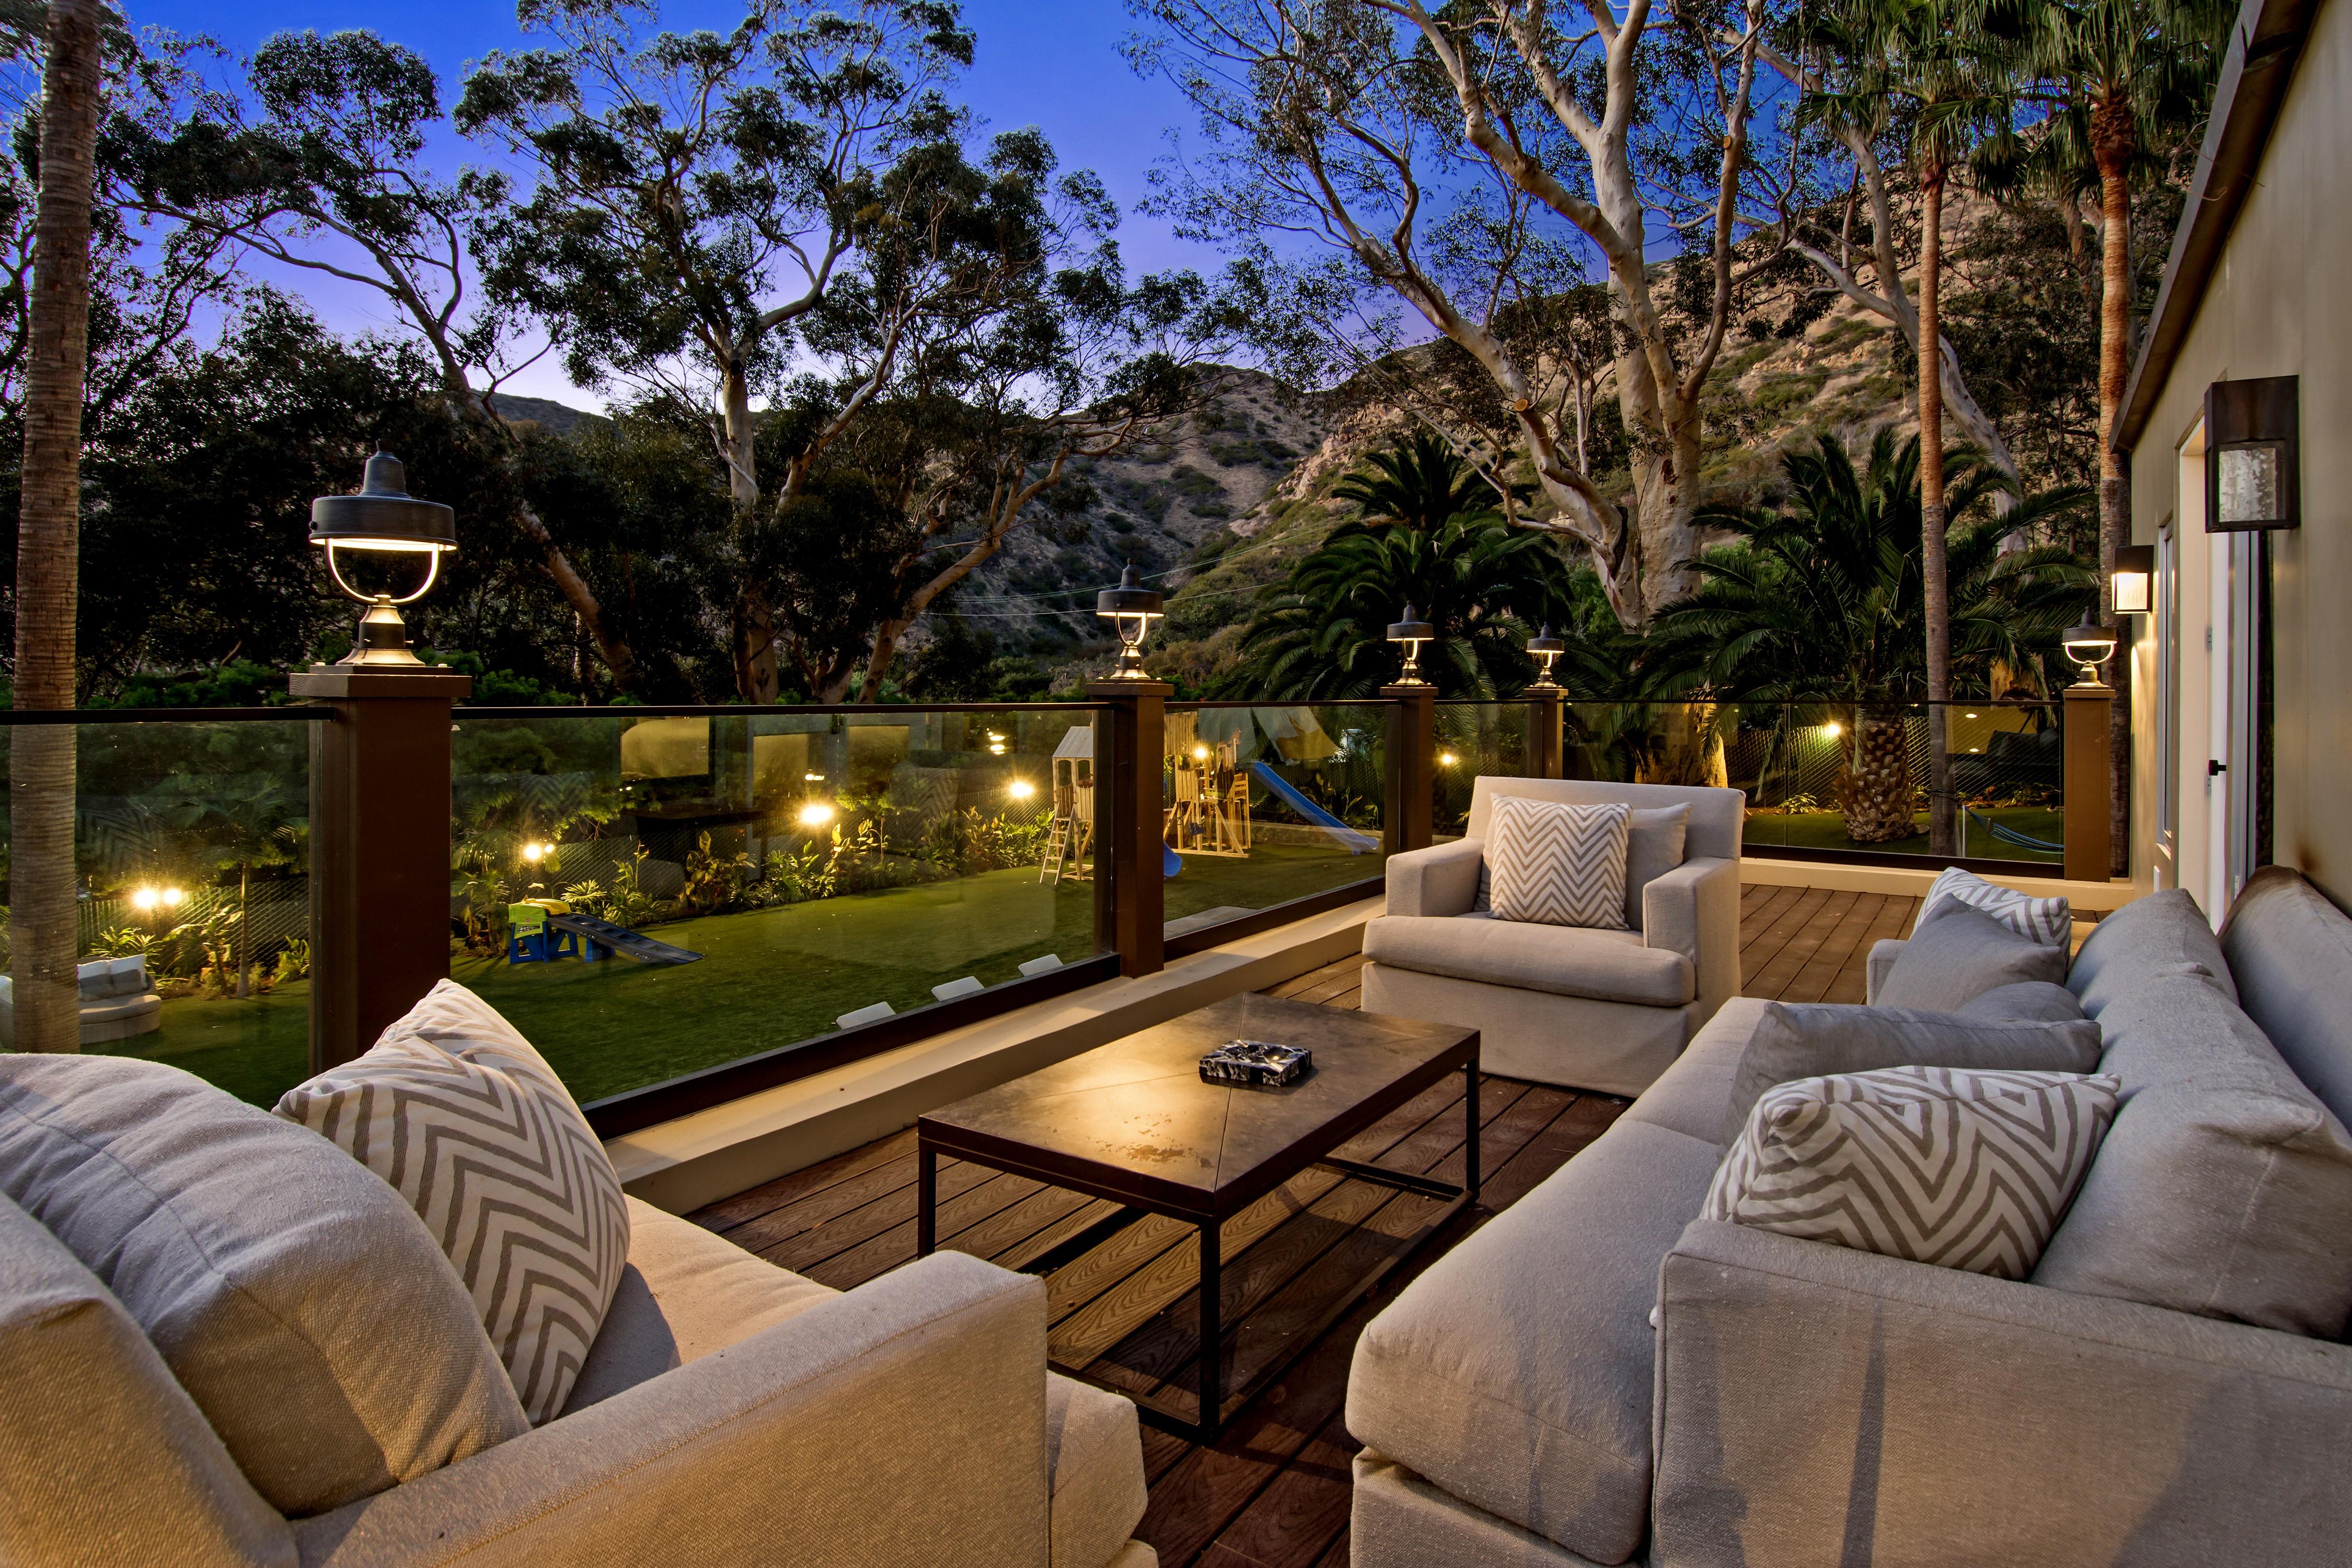 Hot property: billionaire pays US$85 million for Malibu estate ...